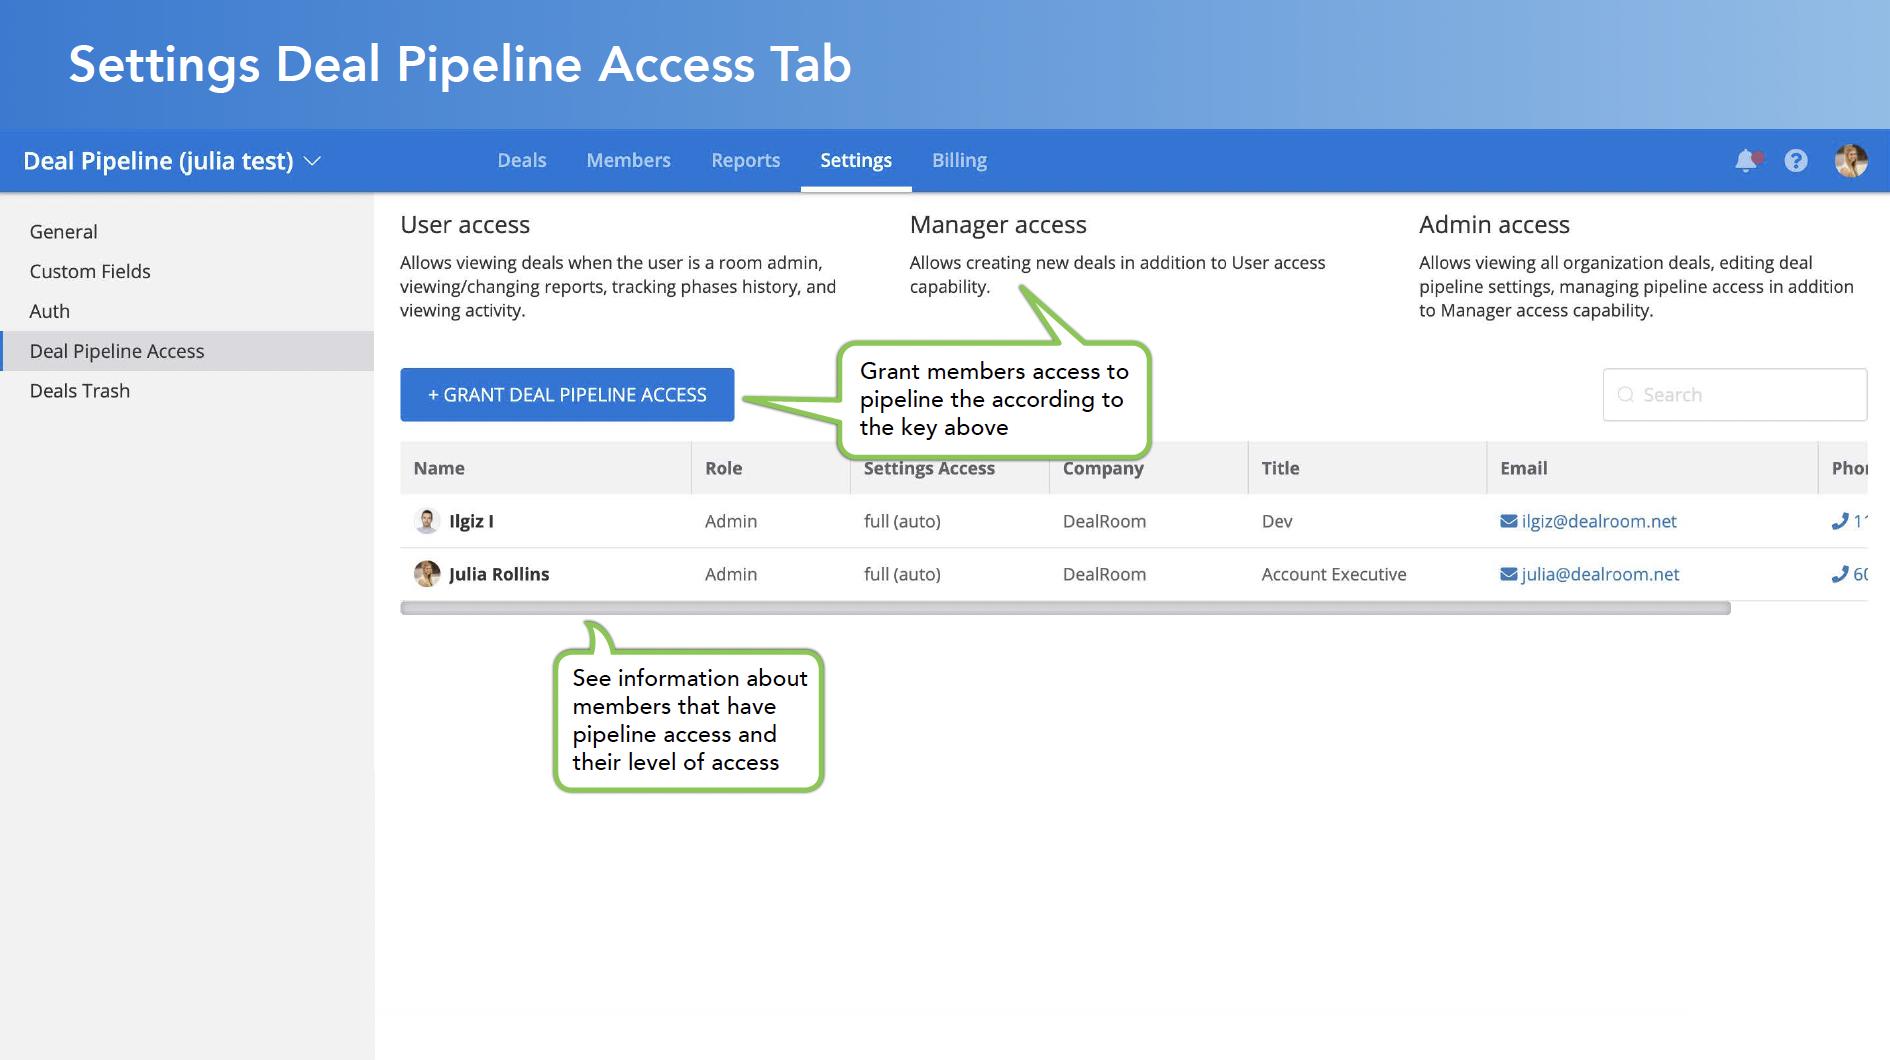 Settings Deal Pipeline Access Tab